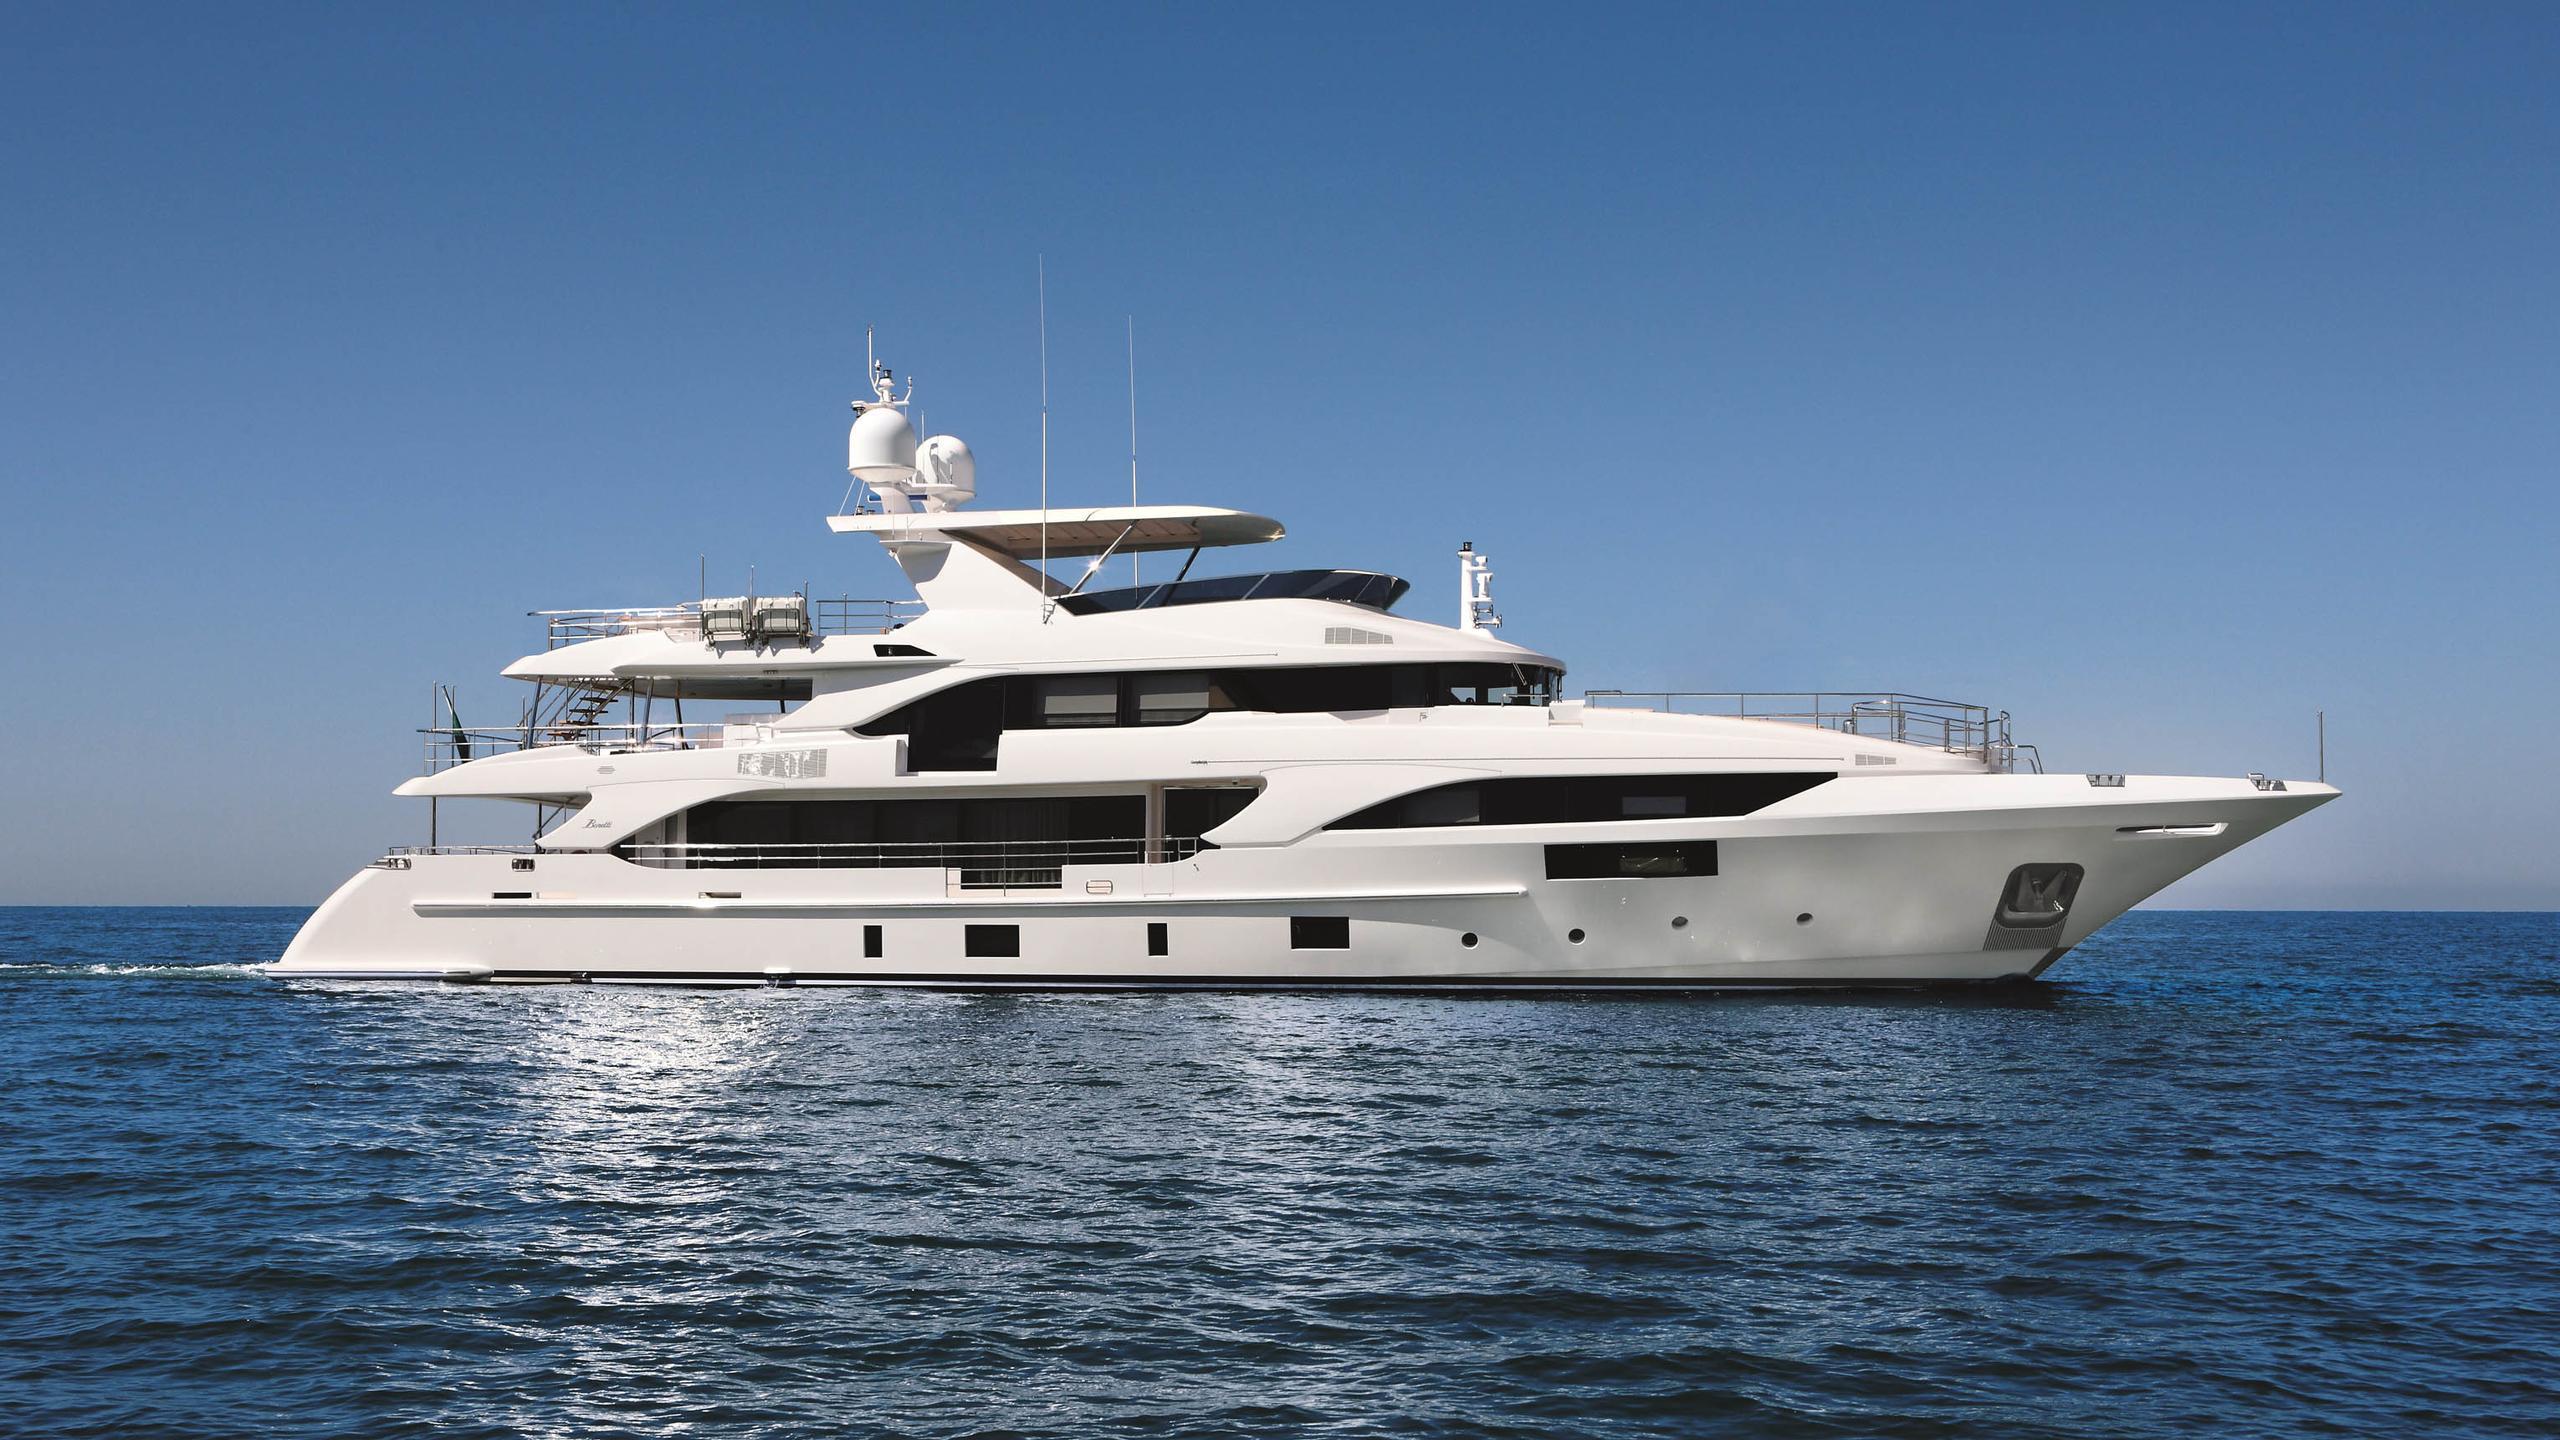 supreme 132 bs010 motoryacht benetti yachts 40m 2018 profile sistership